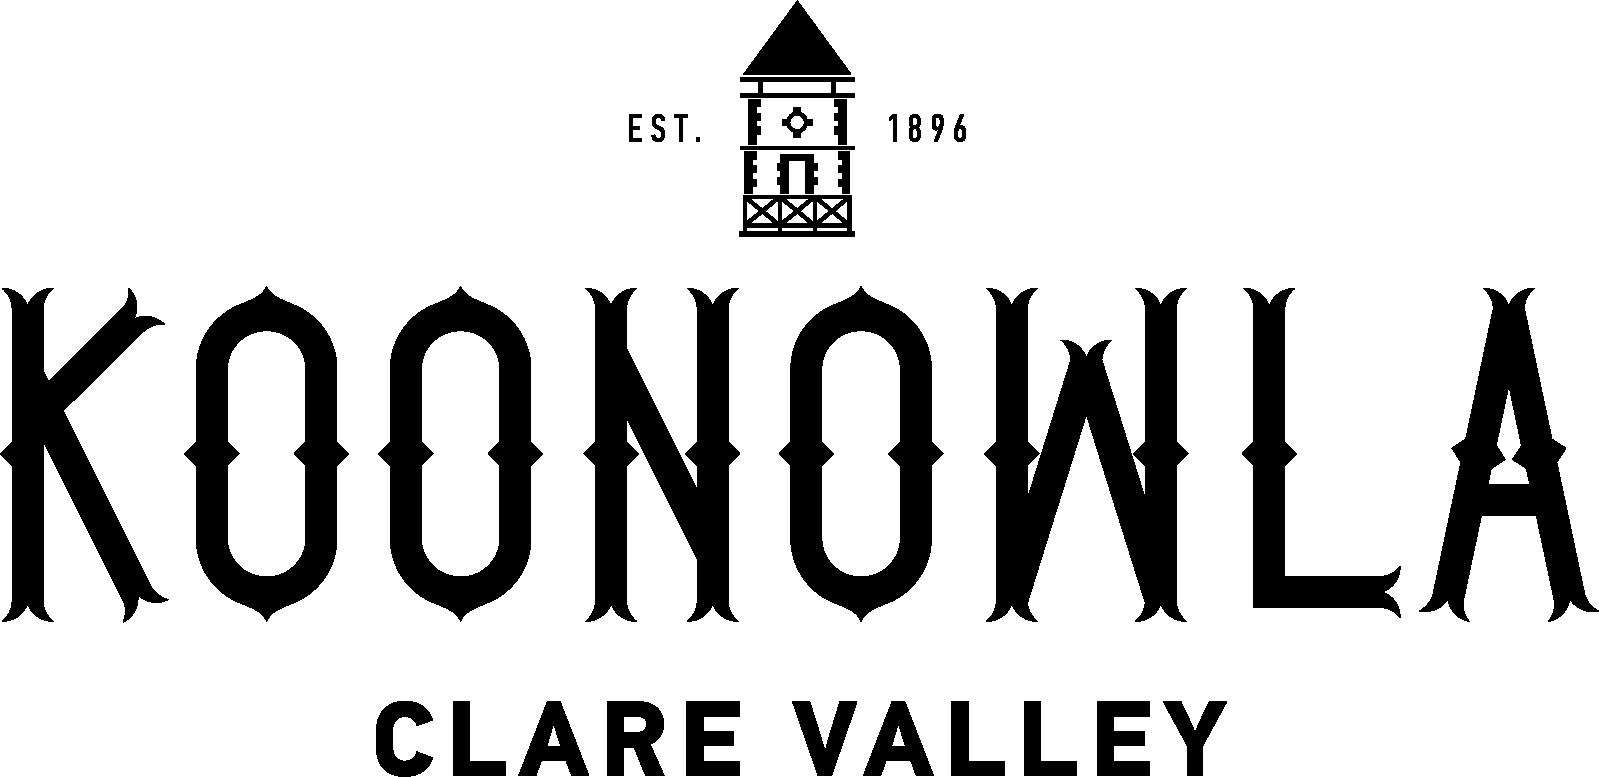 Koonowla